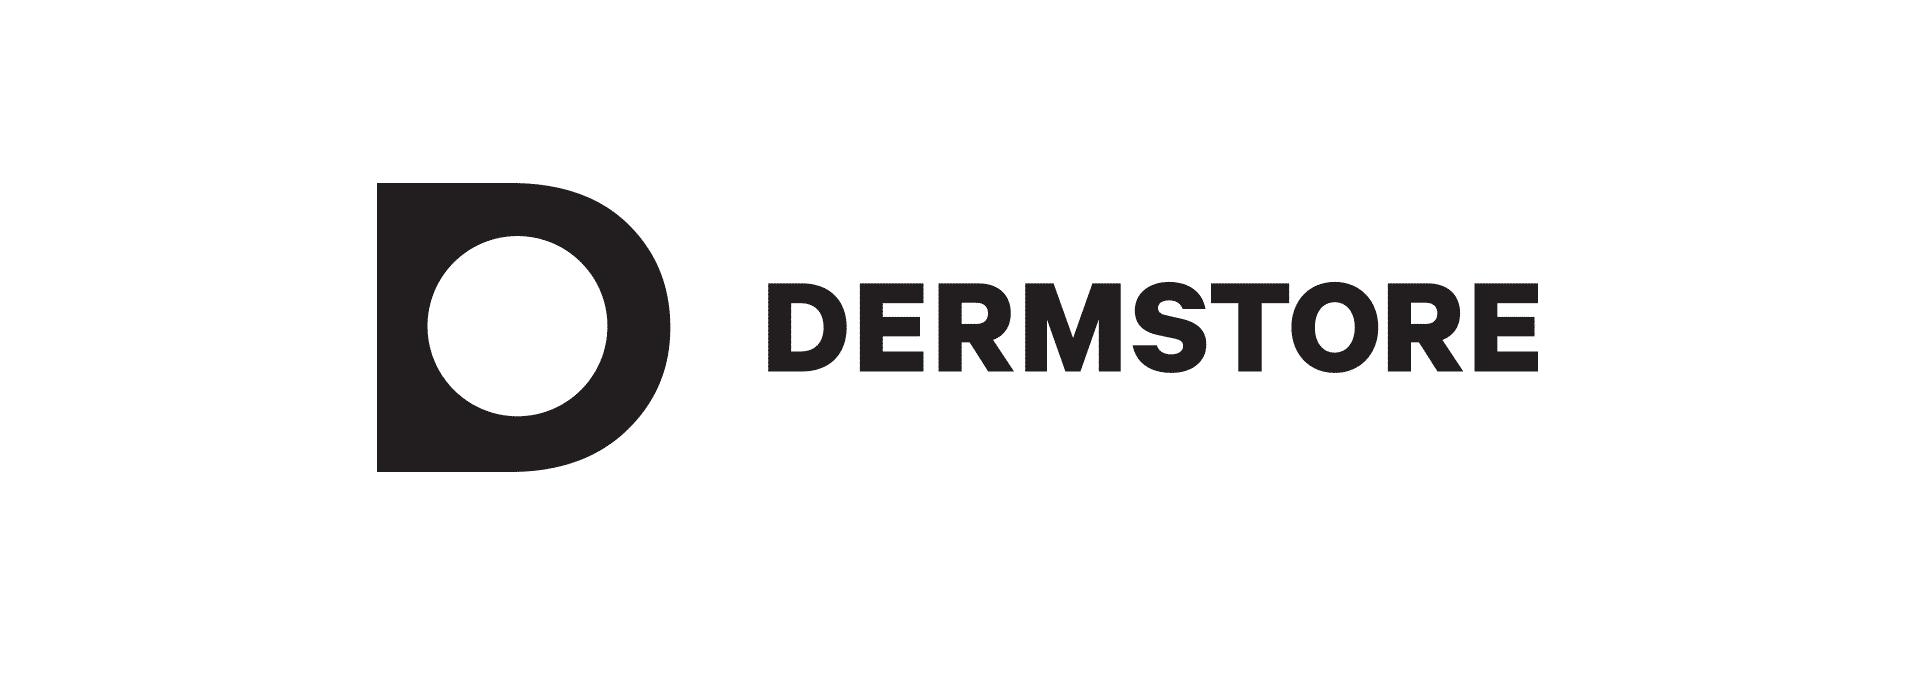 Dermstore logo